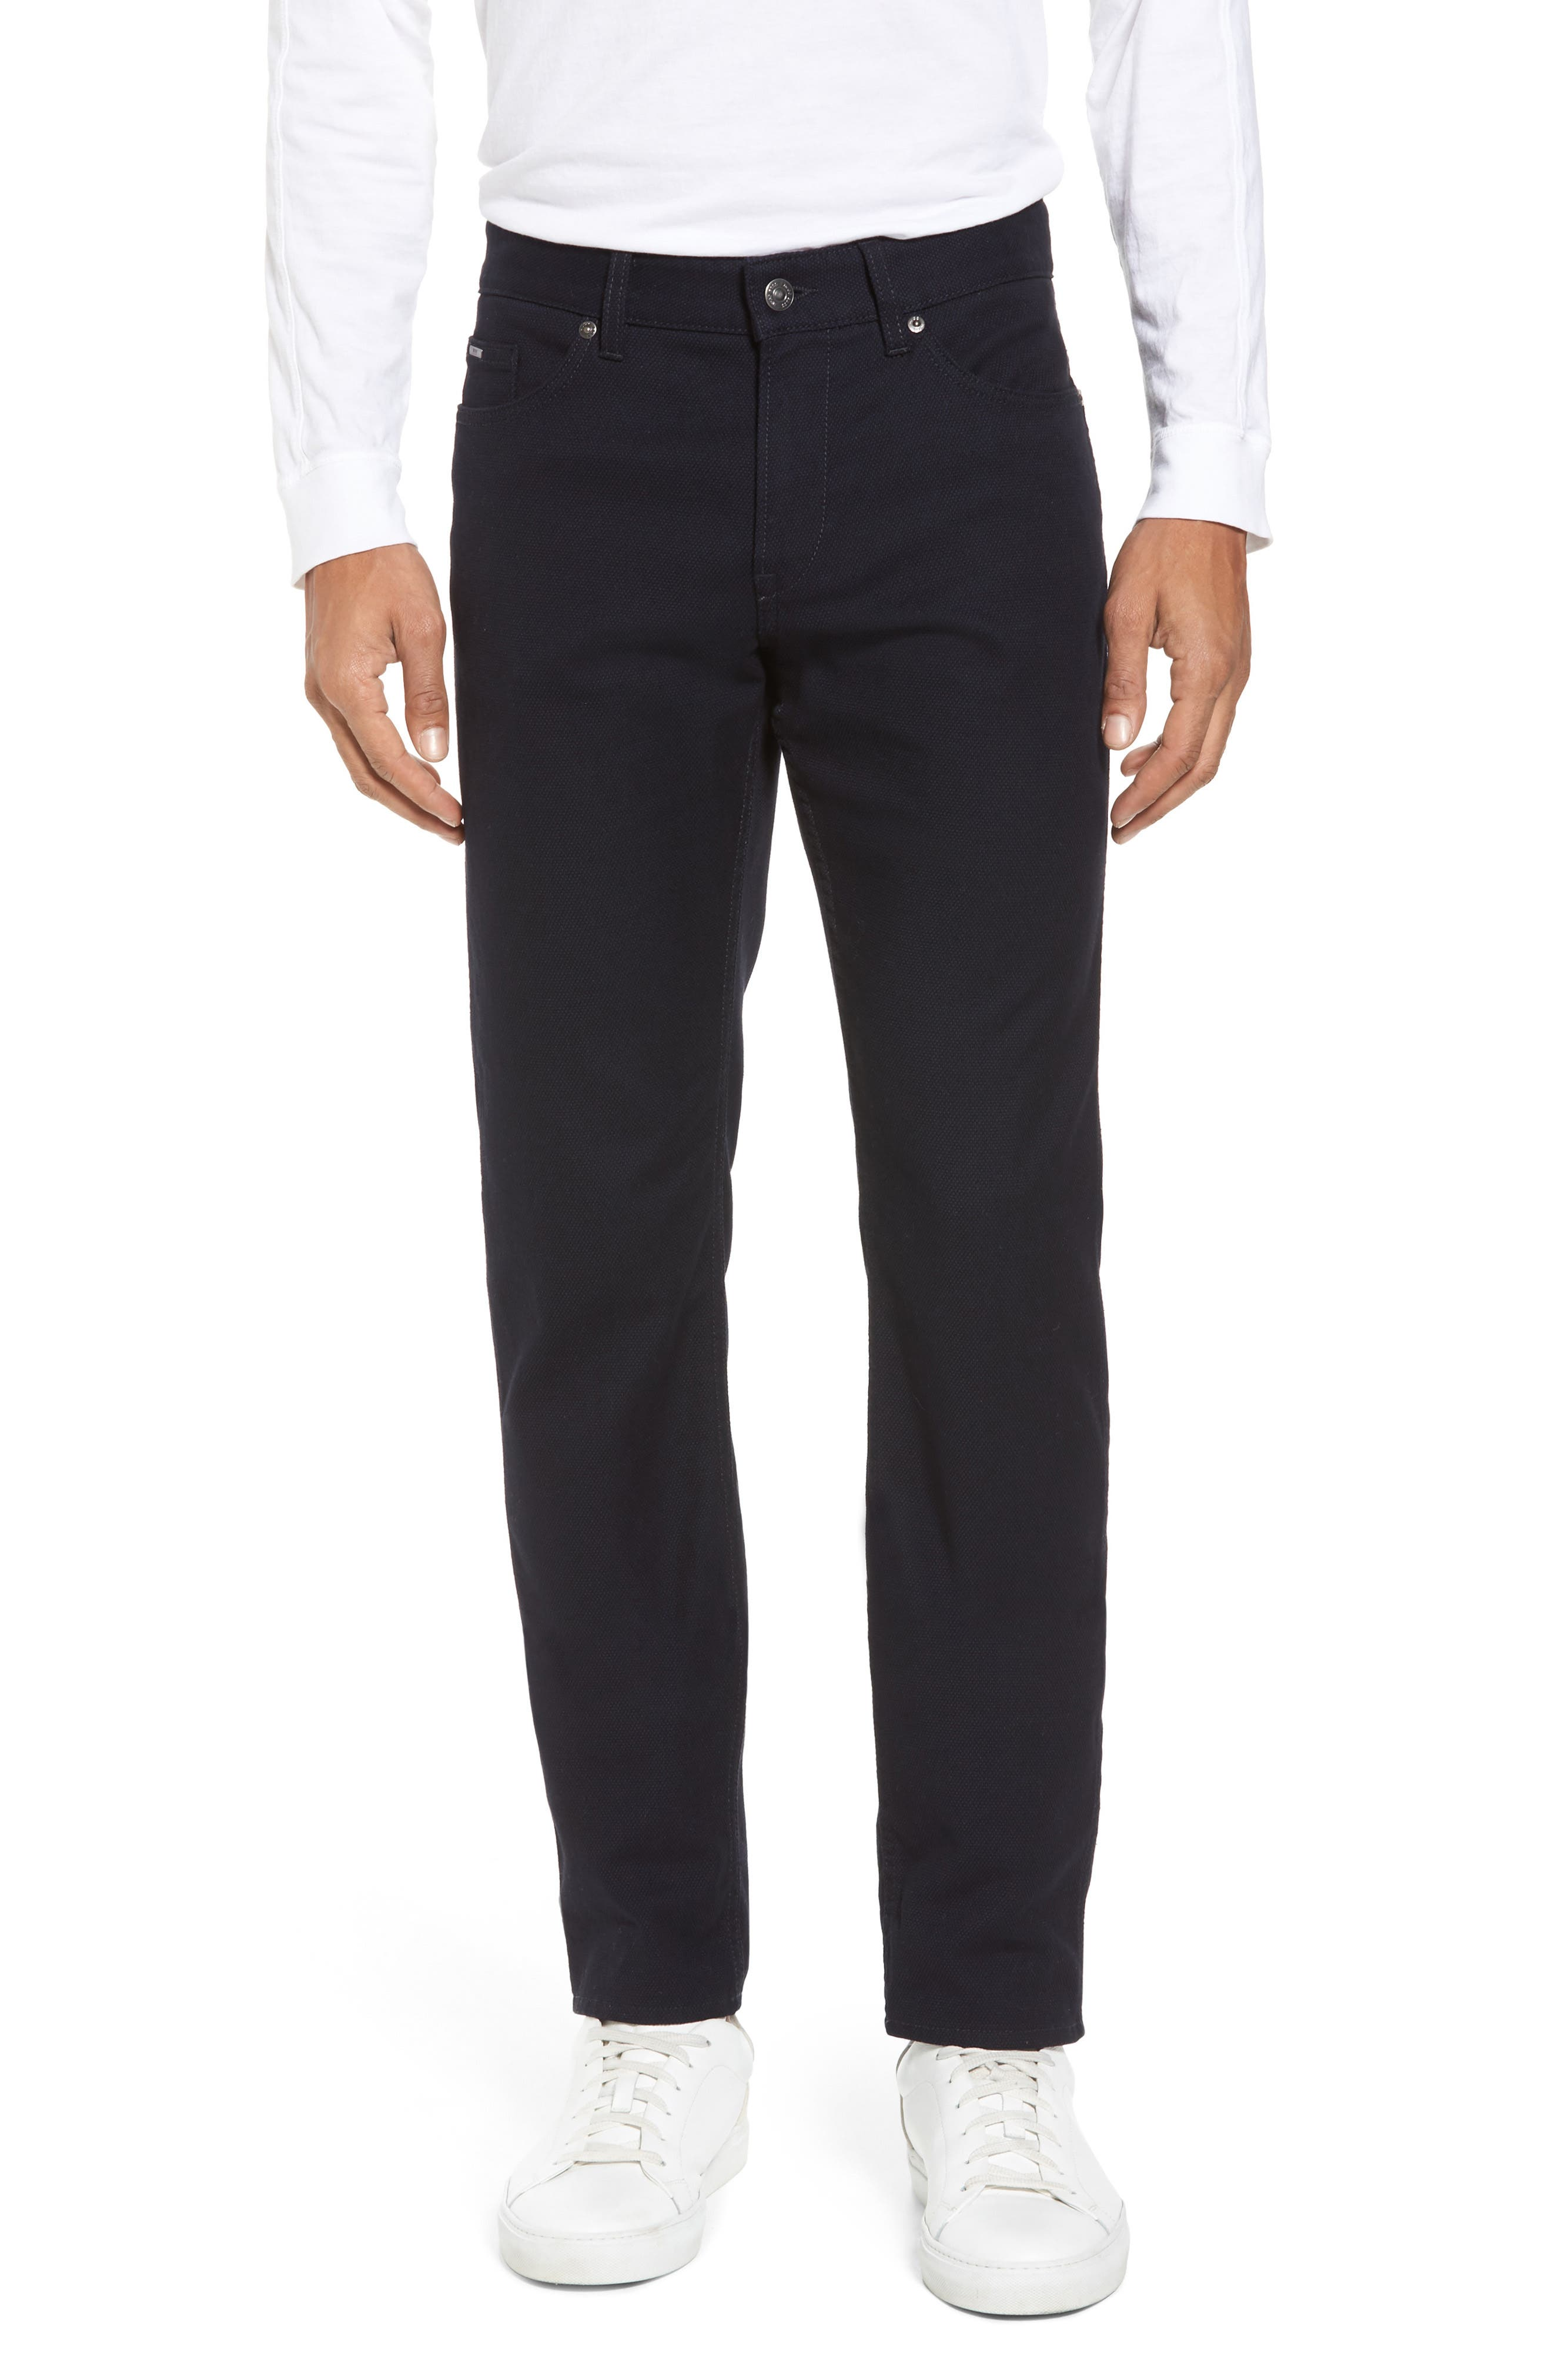 Delaware Slim Microtexture Five Pocket Pants,                         Main,                         color, Navy